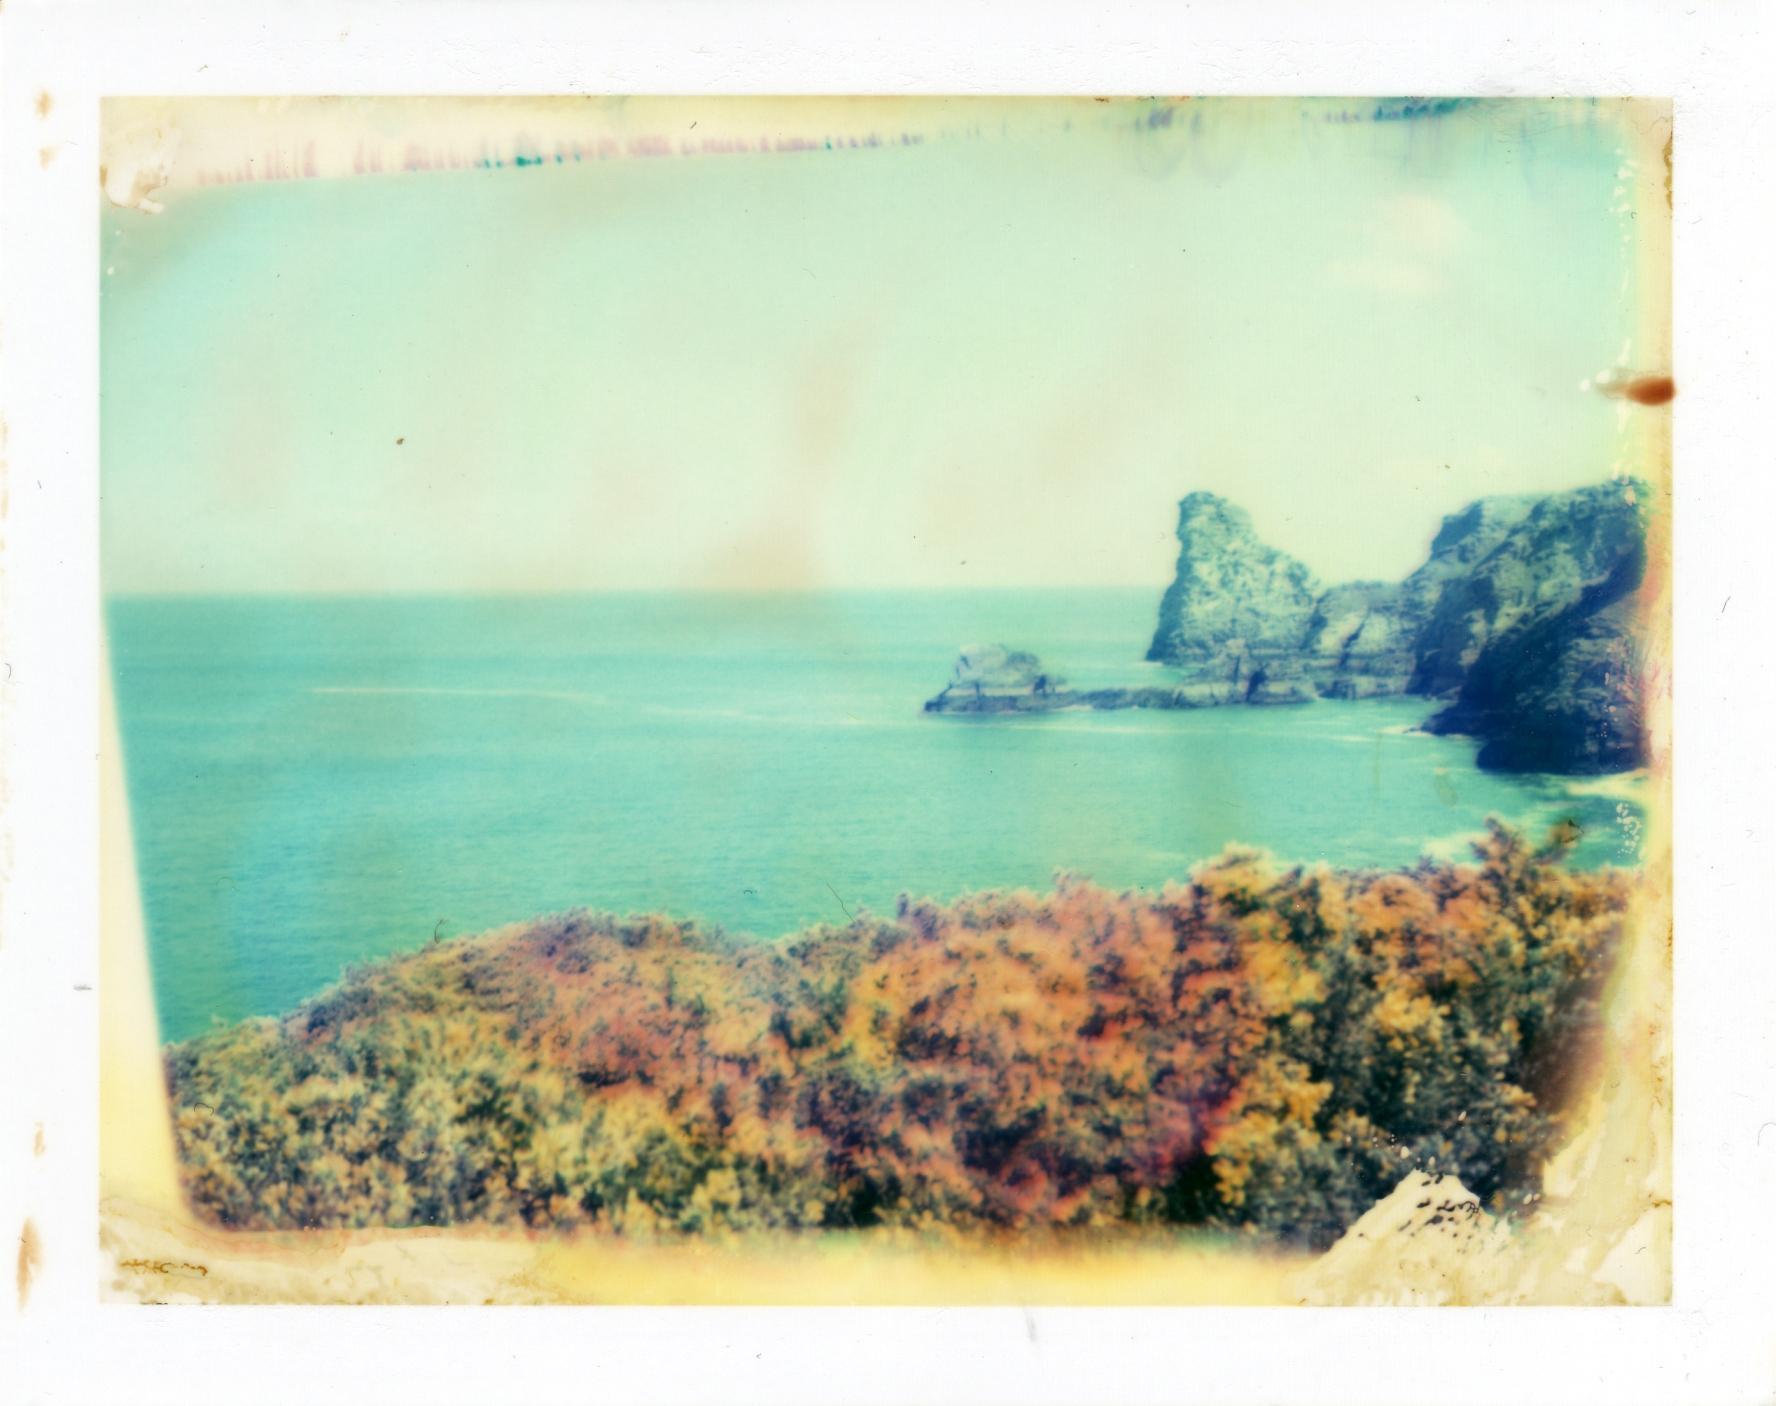 Hintergrundbilder : Ausflug, Polaroid, Felsen, Cornwall, Klippen ...